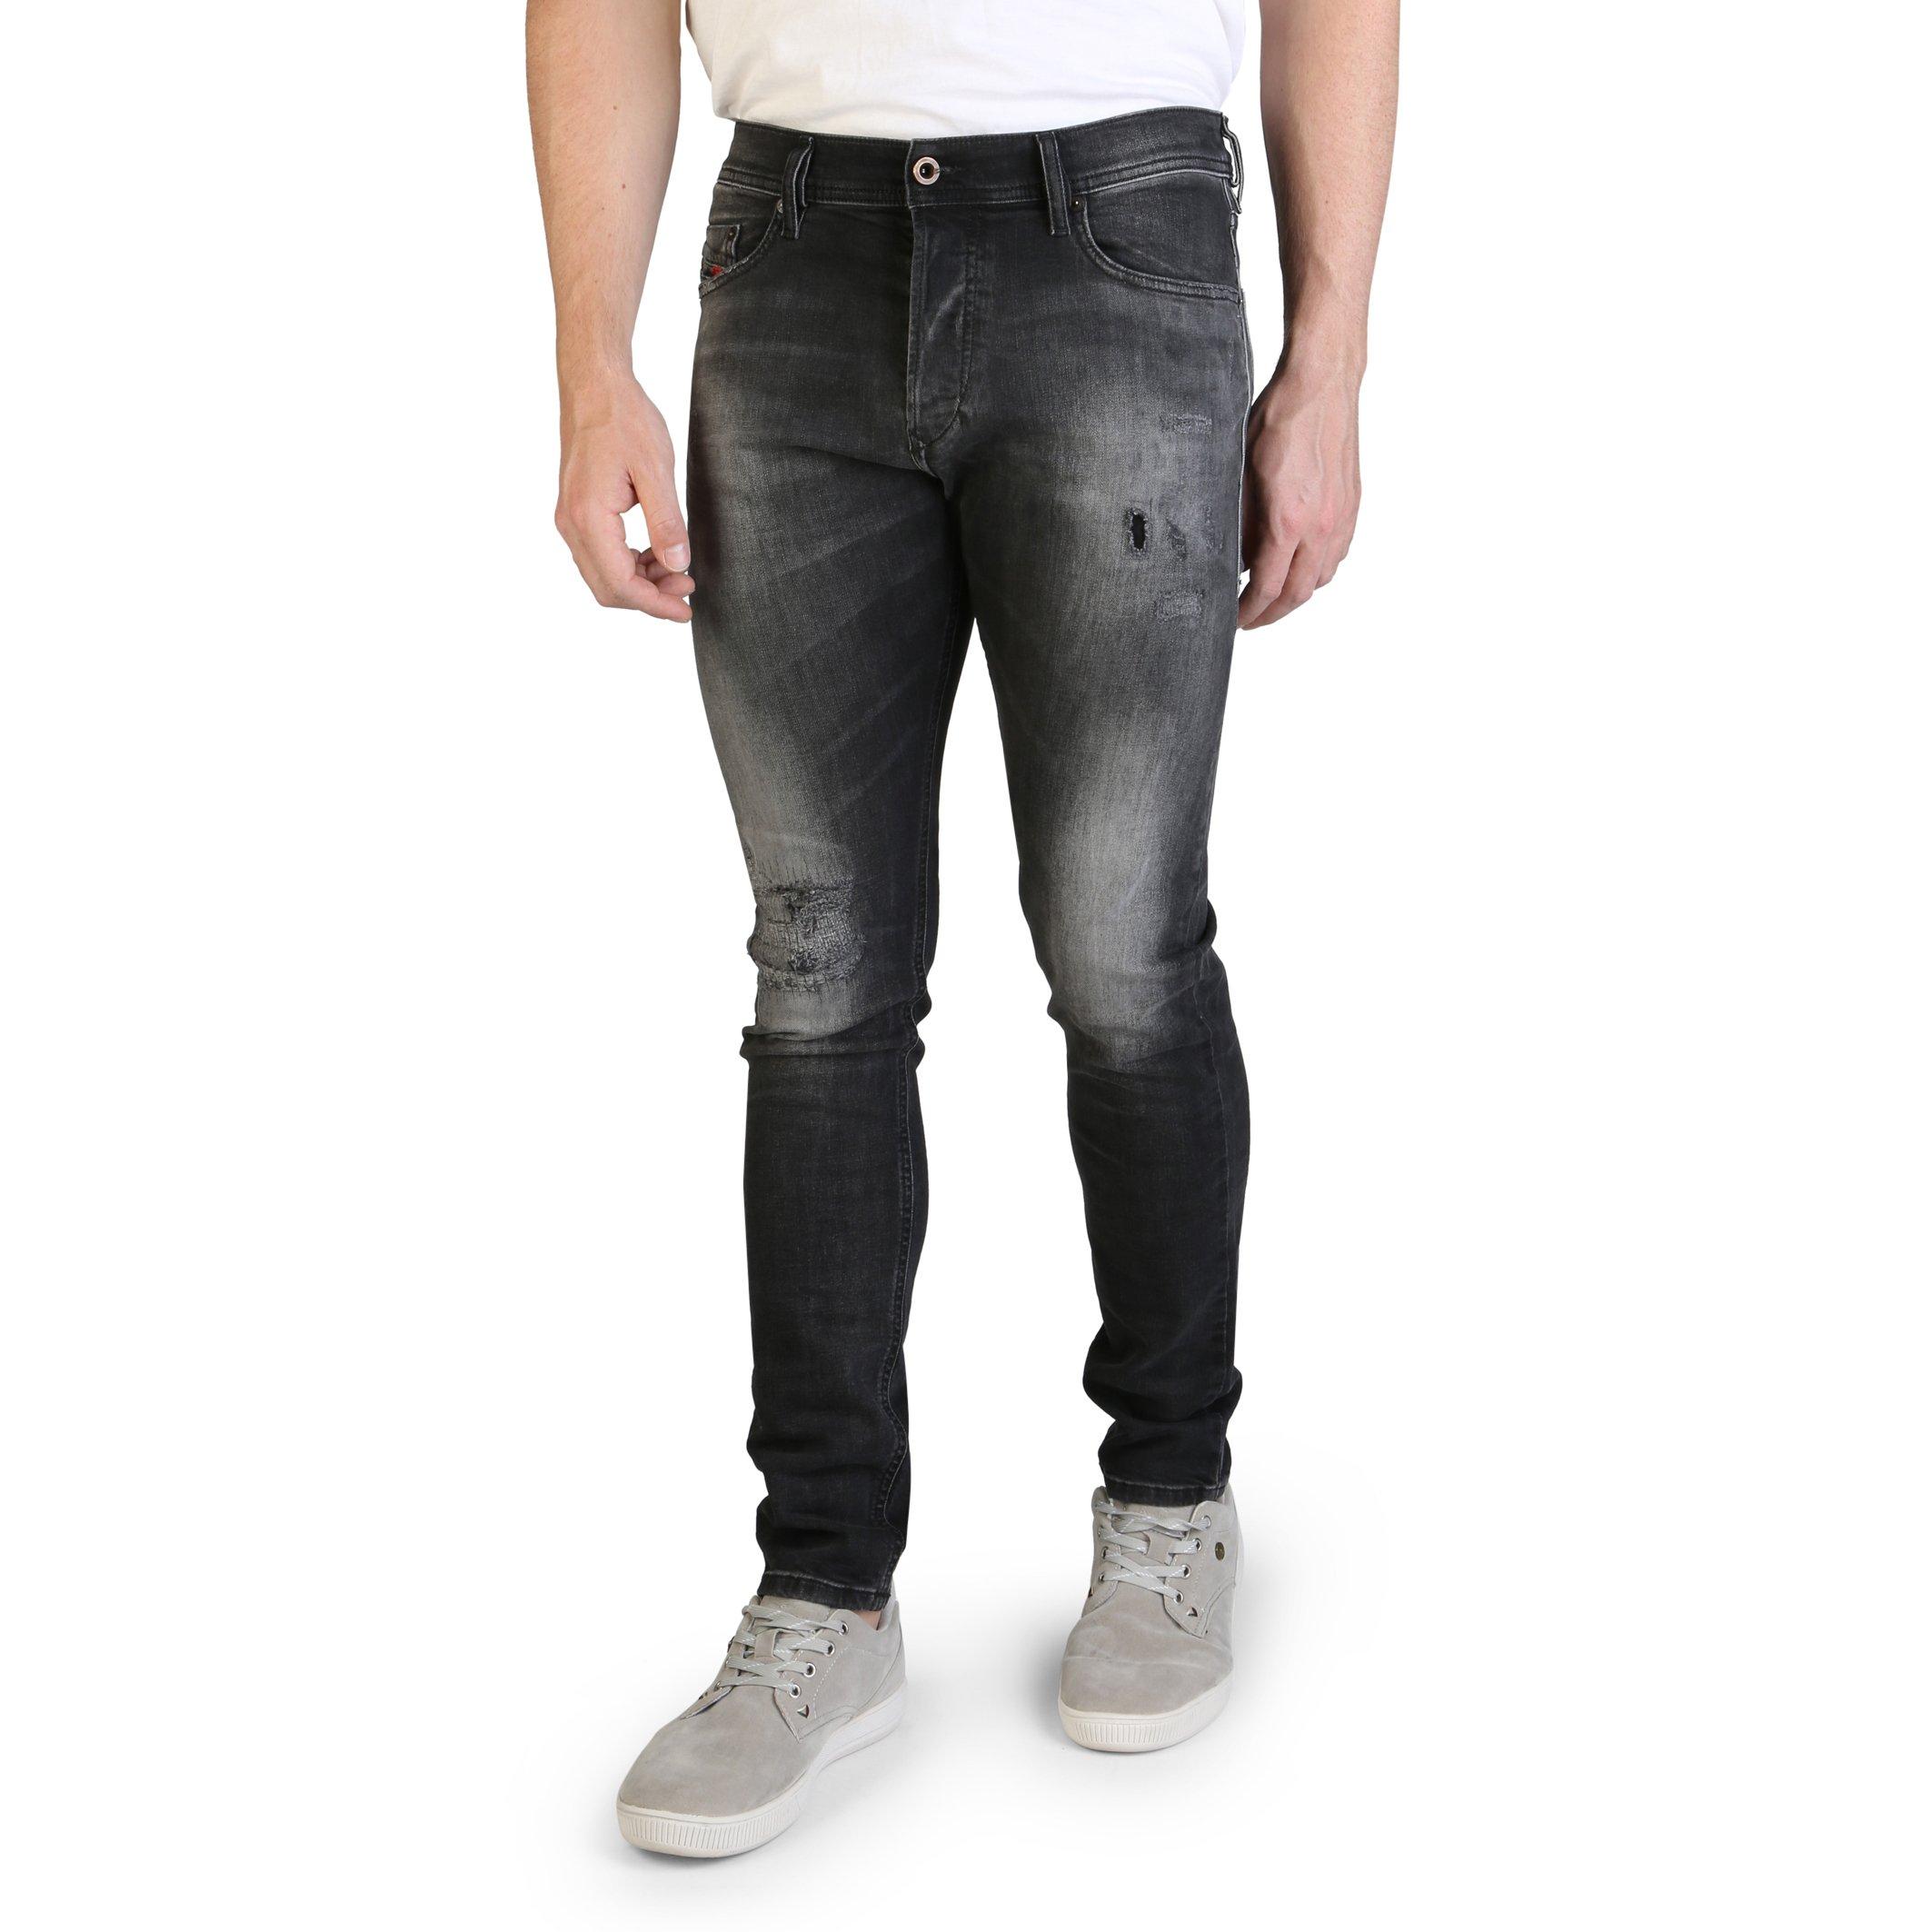 Diesel Men's Jeans Black TEPPHAR_L32_00CKRI - black-1 29